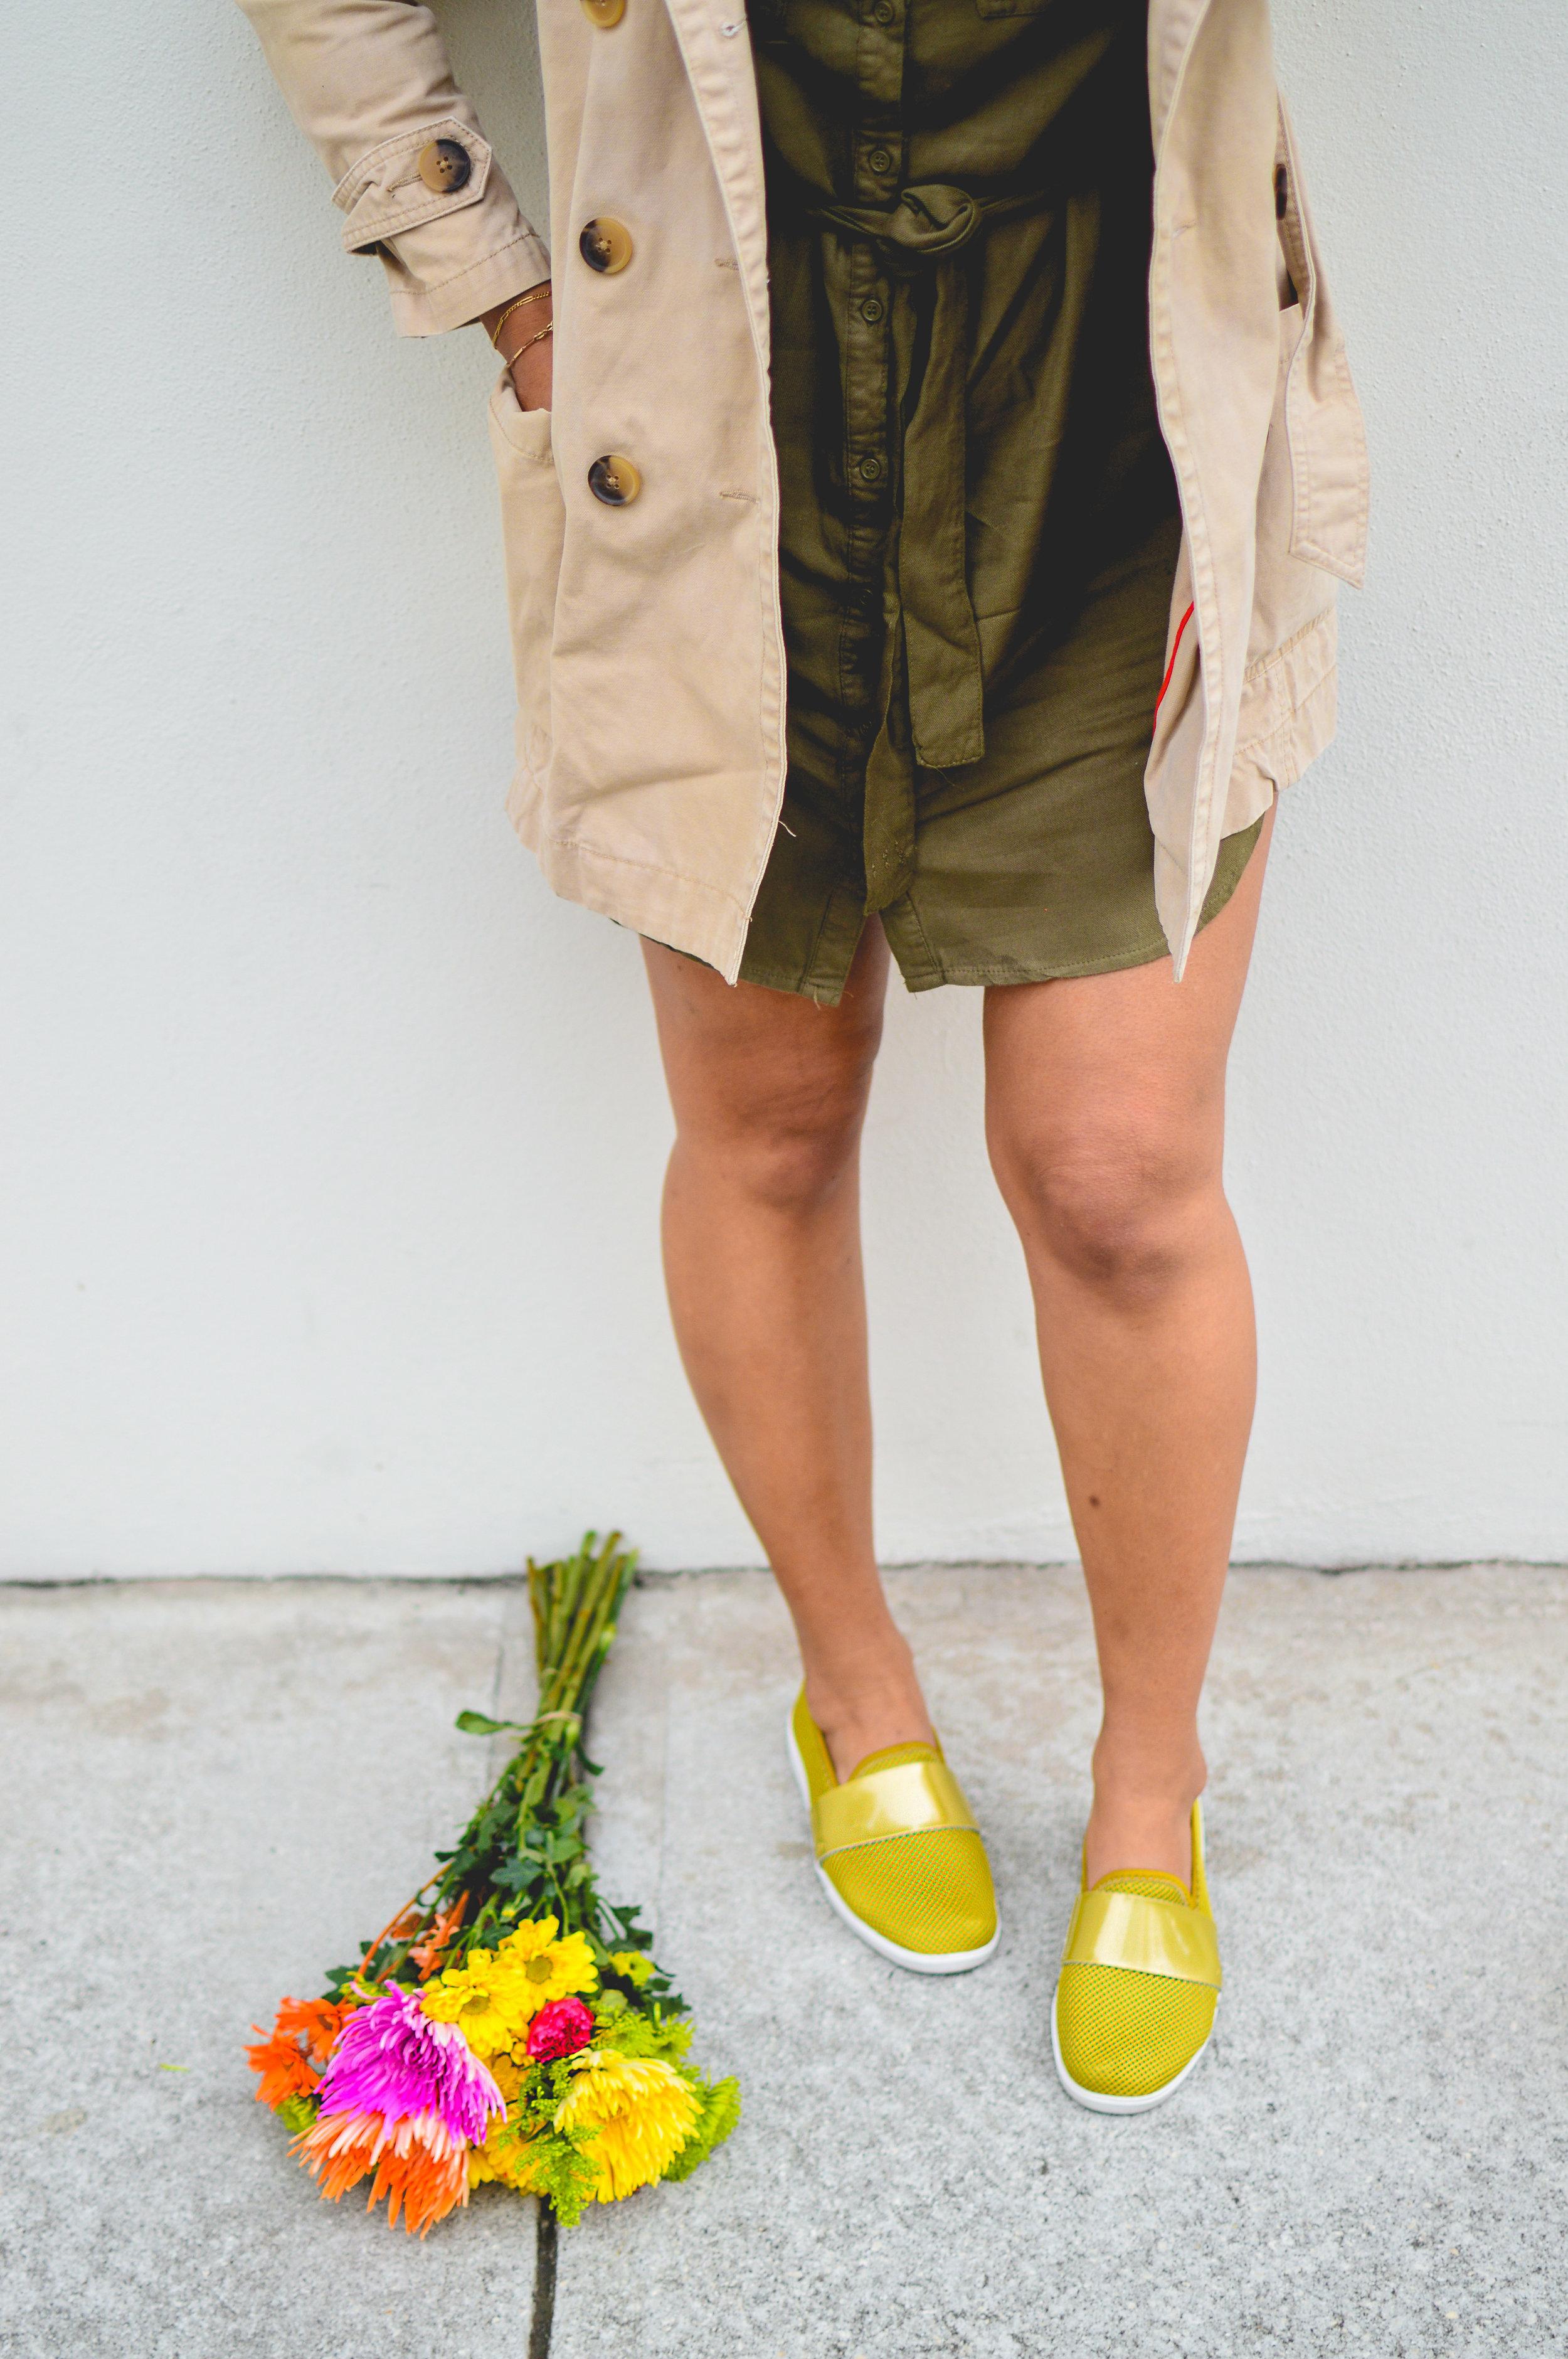 suavs-shoes-slip-ons